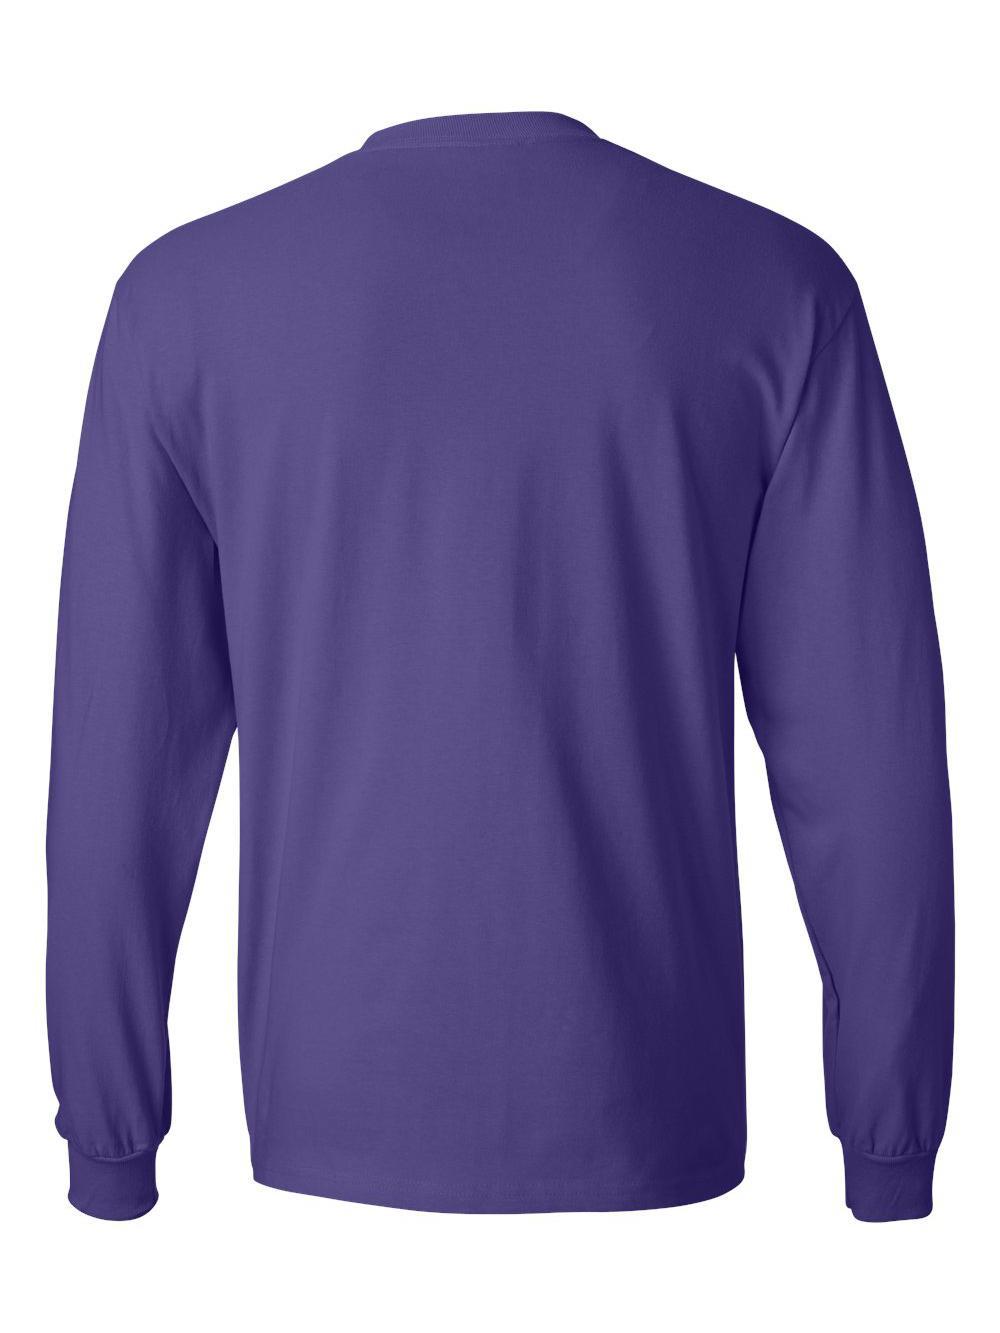 Hanes-Beefy-T-Long-Sleeve-T-Shirt-5186 thumbnail 46